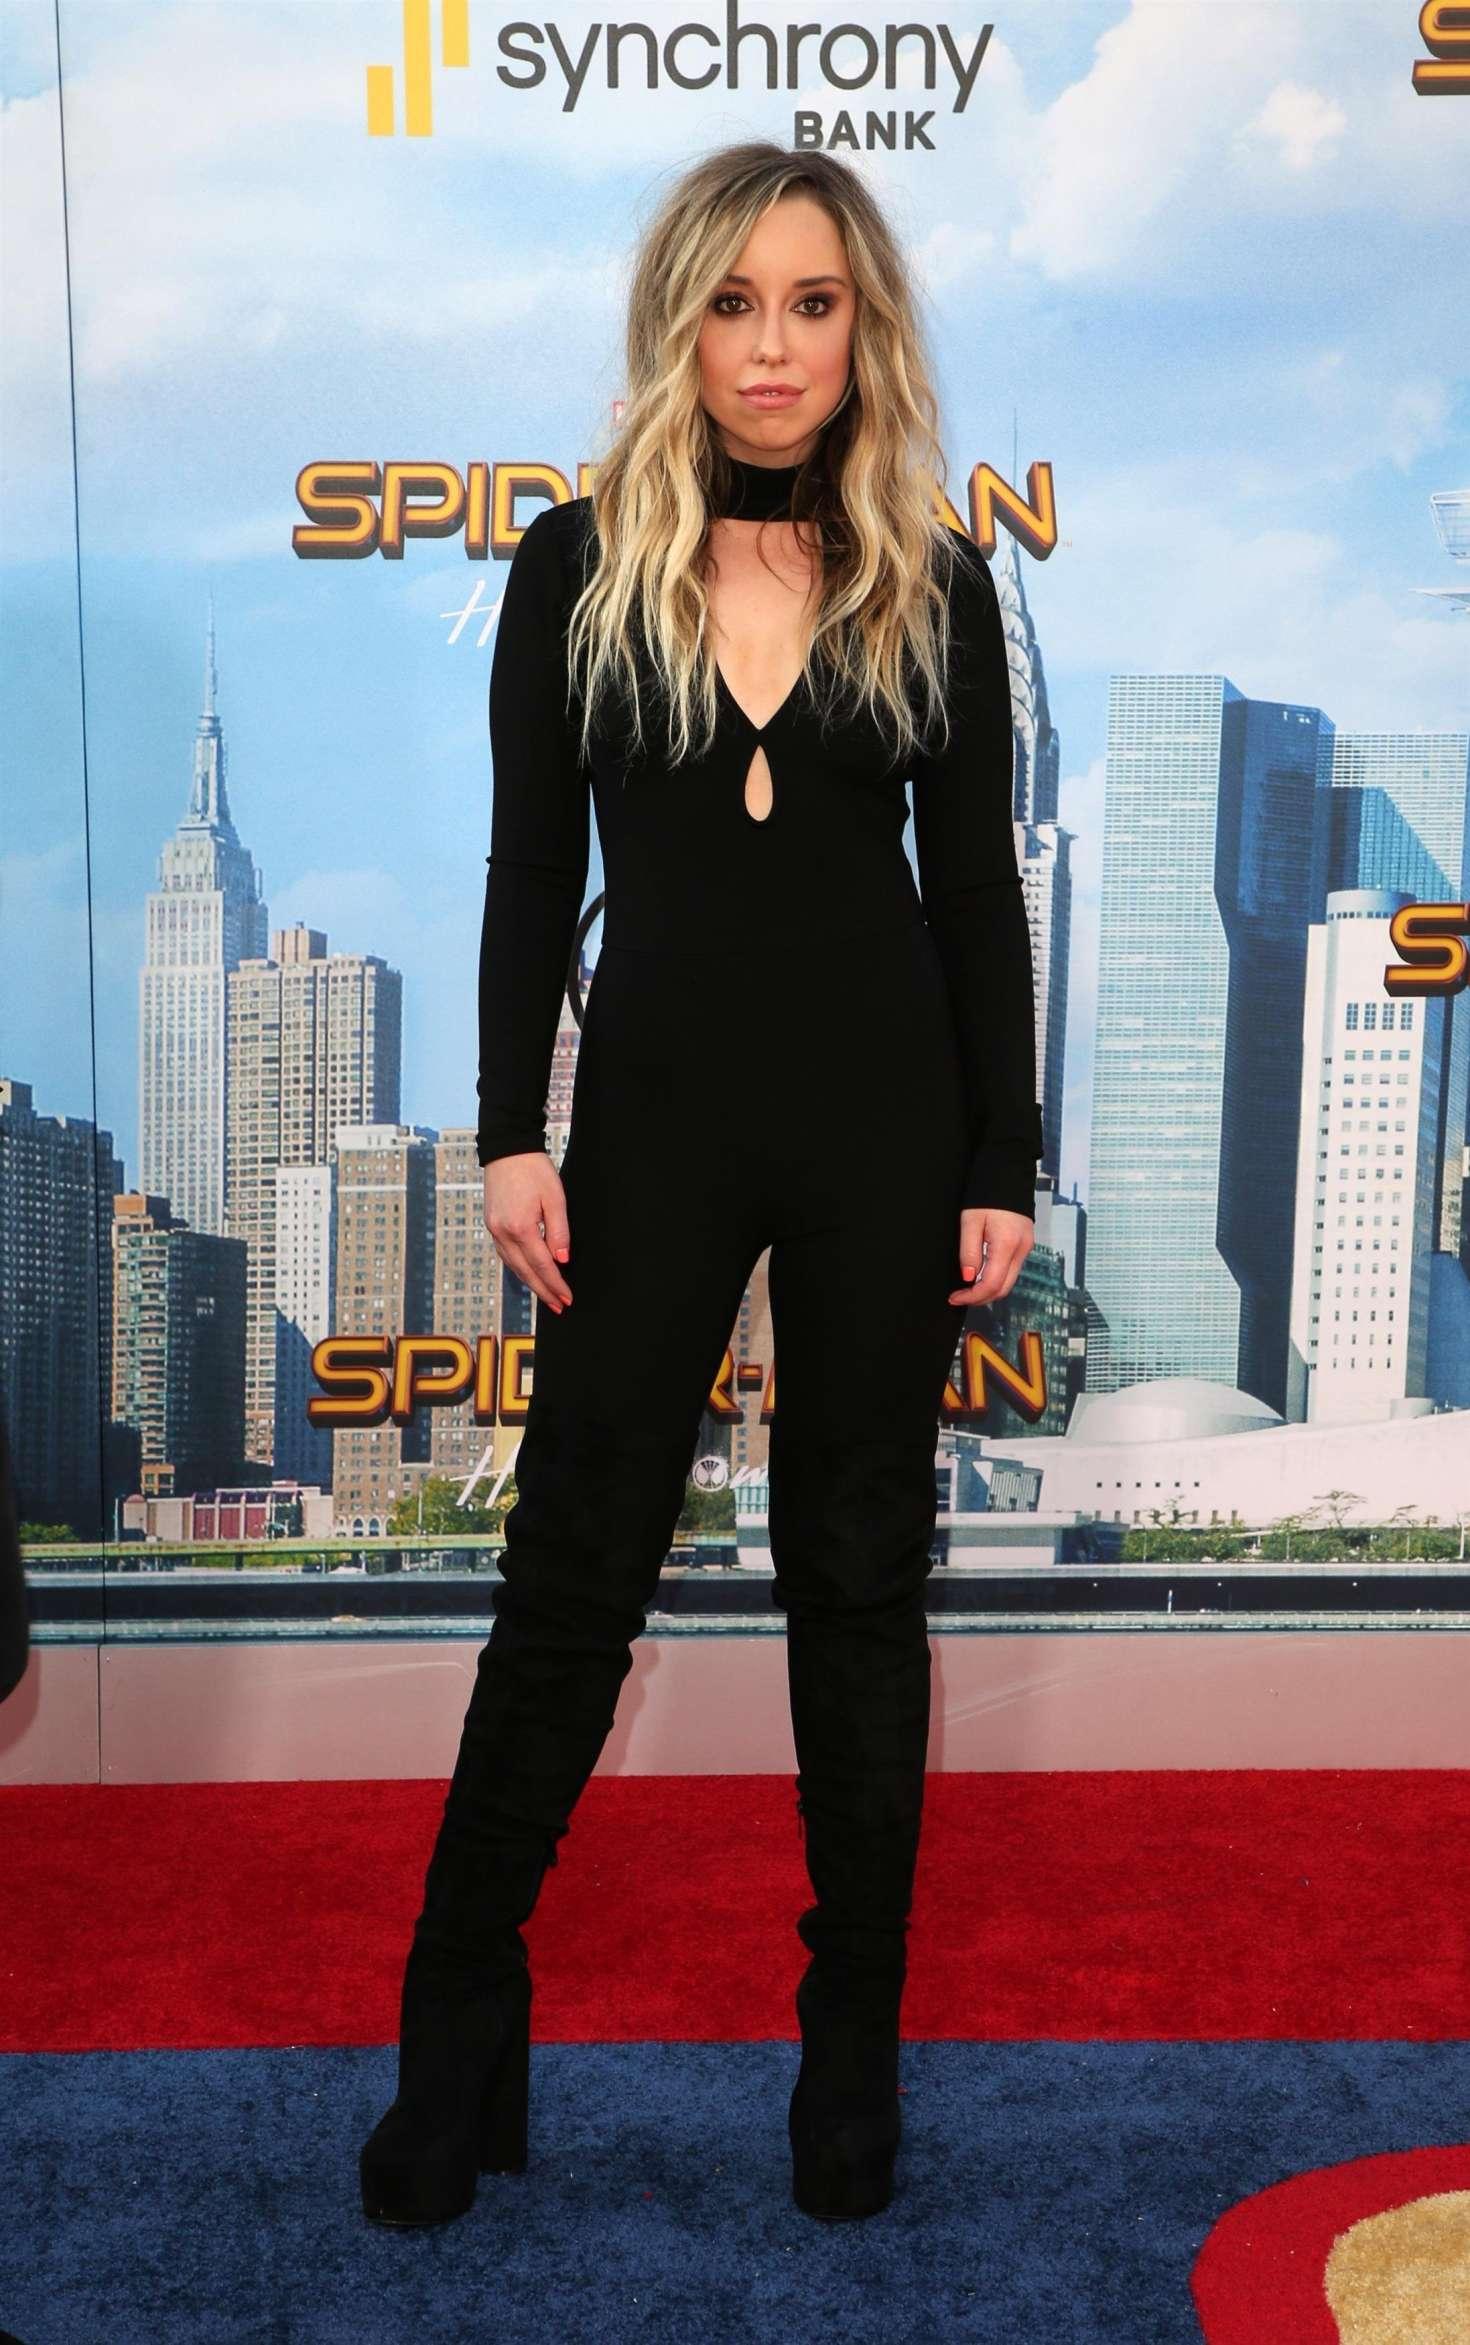 Skyler Shaye 2017 : Skyler Shaye: Spider-Man: Homecoming Premiere in Hollywood -04